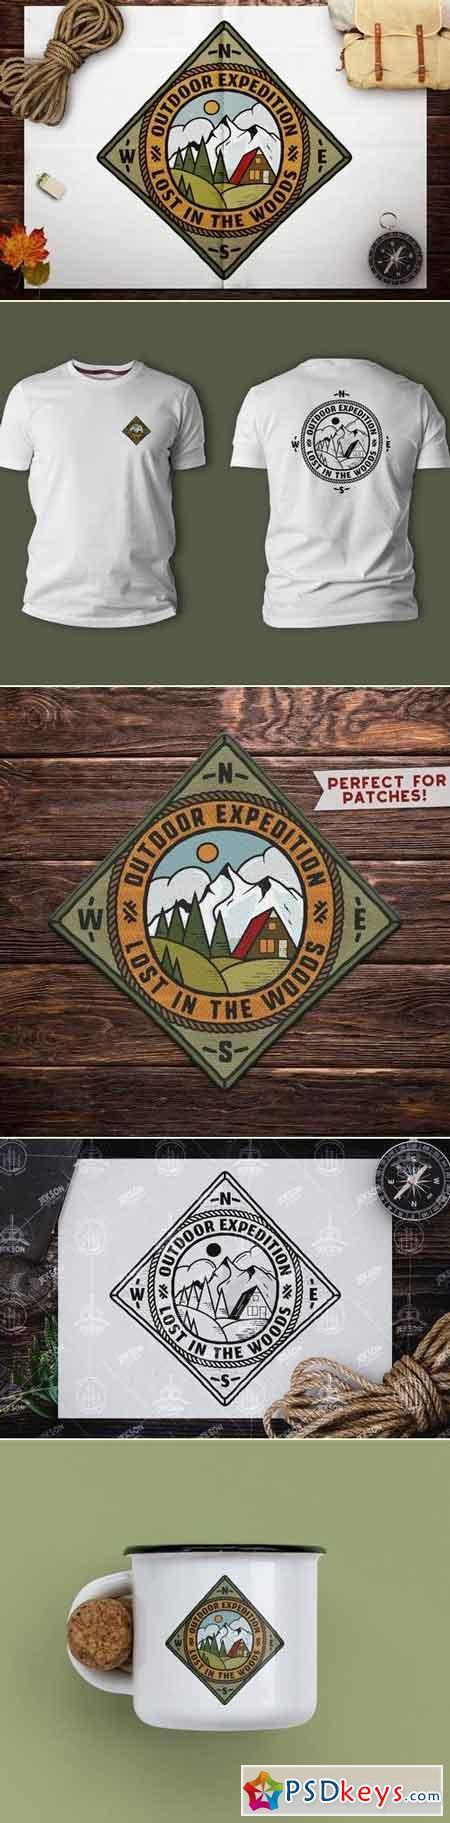 Retro Travel Emblem Vintage Camping Logo Patch